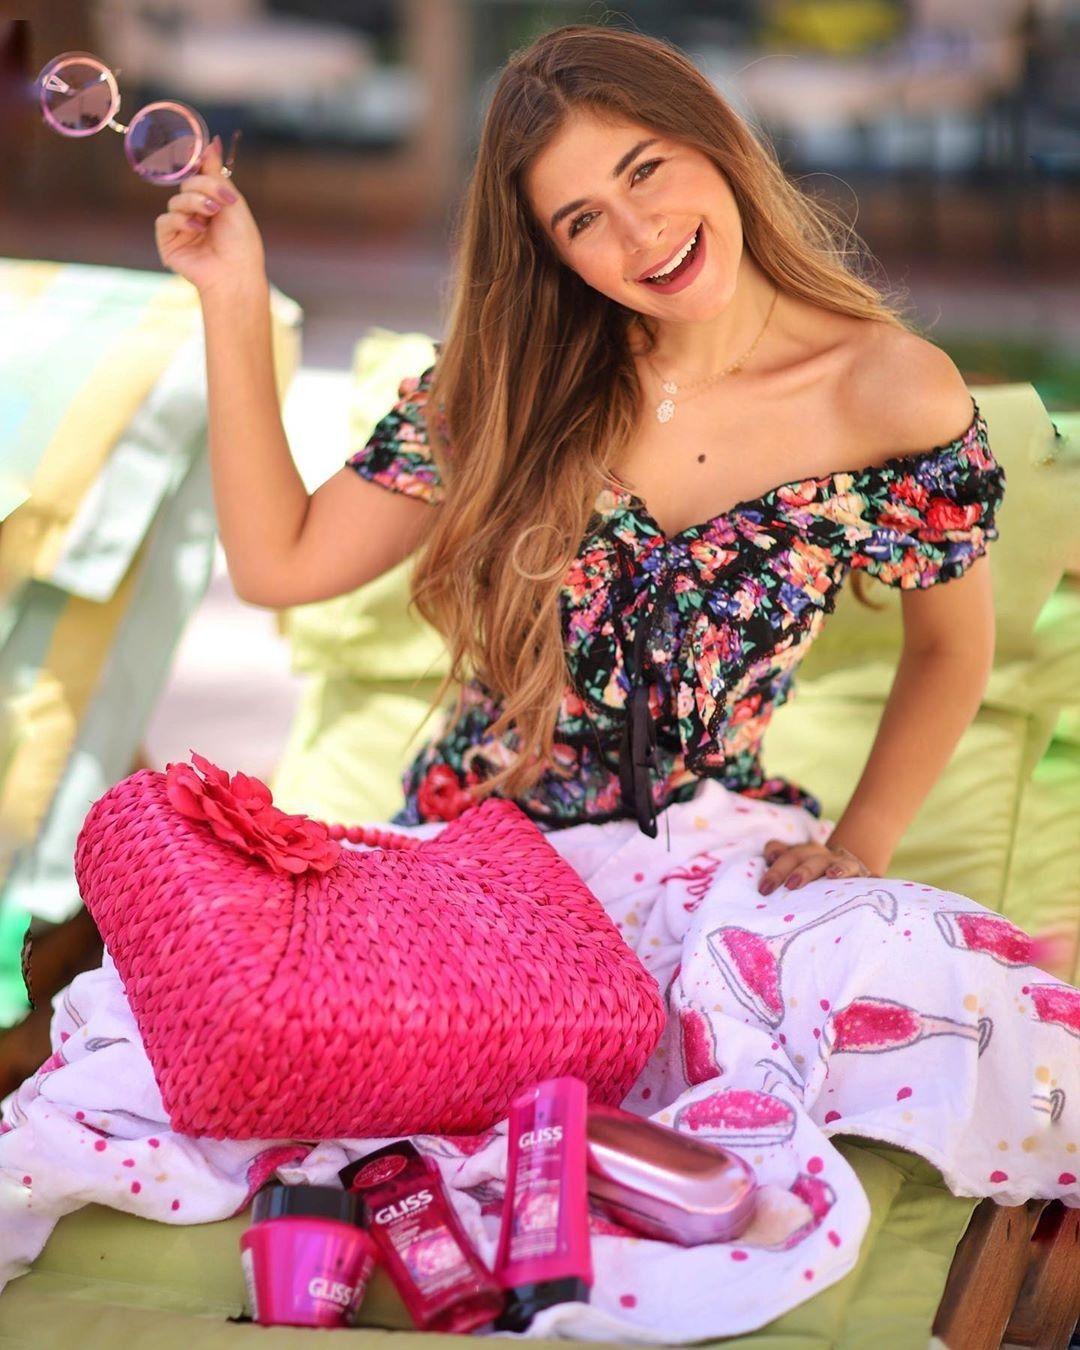 Beautiful Smile Malak Koura Egyptian Actress Arab Girls Egyptian Actress Beauty Full Girl Arab Girls